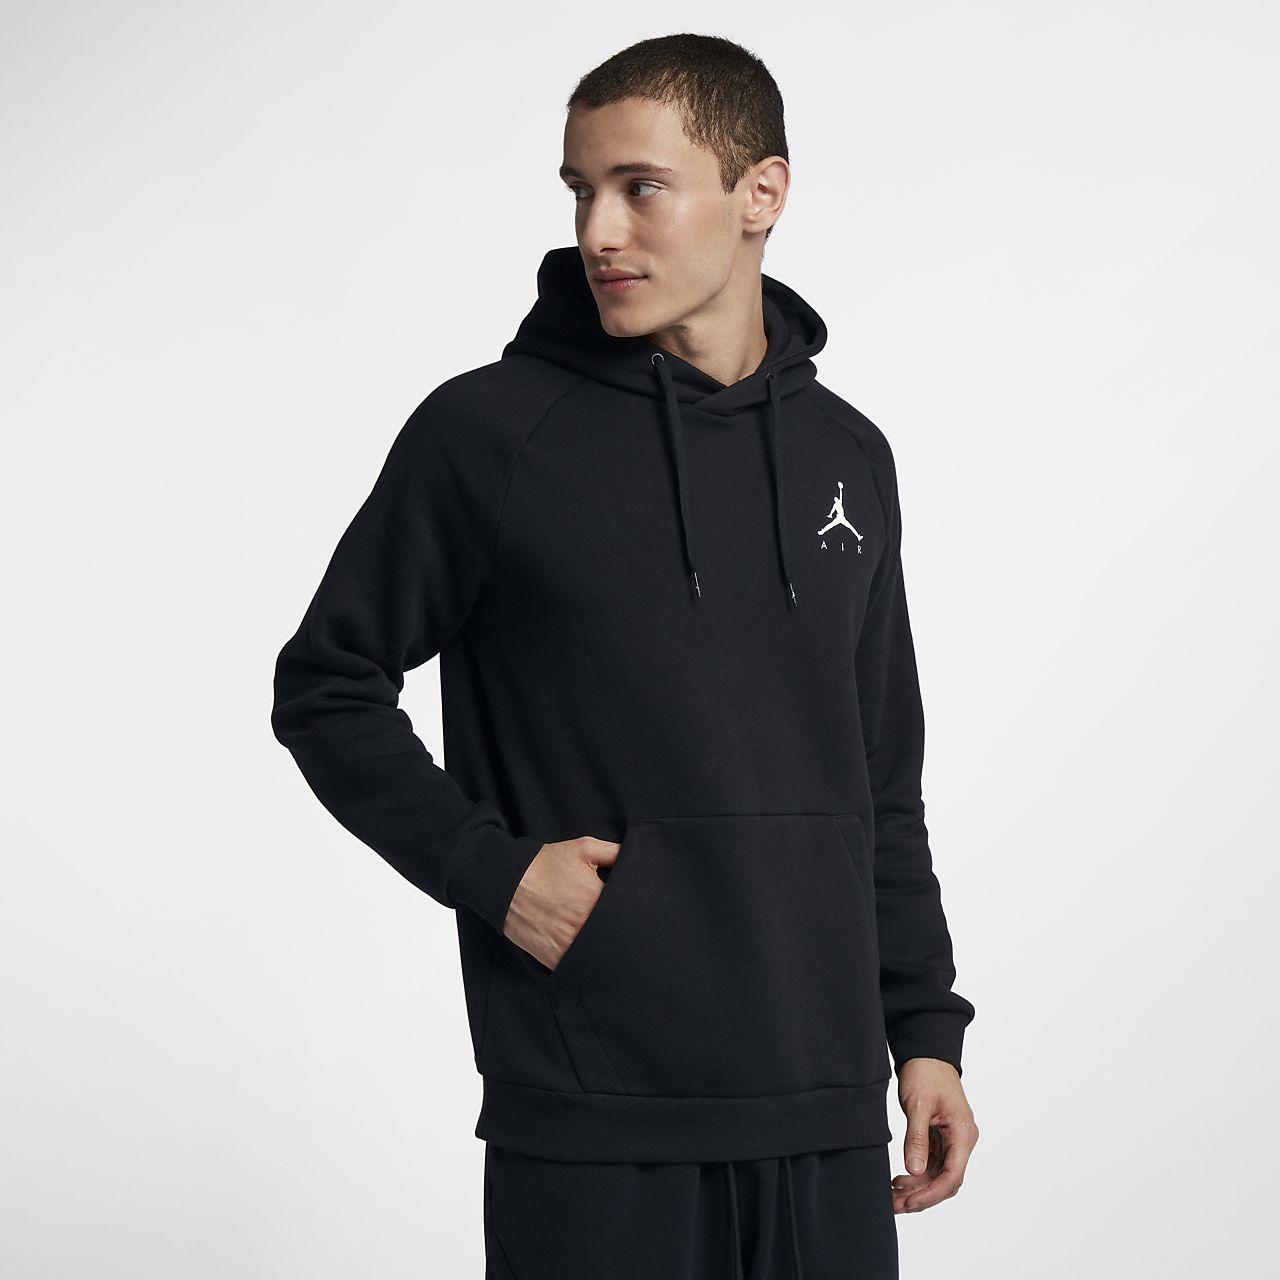 72f7c16f97 Jordan Jumpman Men s Fleece Pullover Hoodie. Nike.com